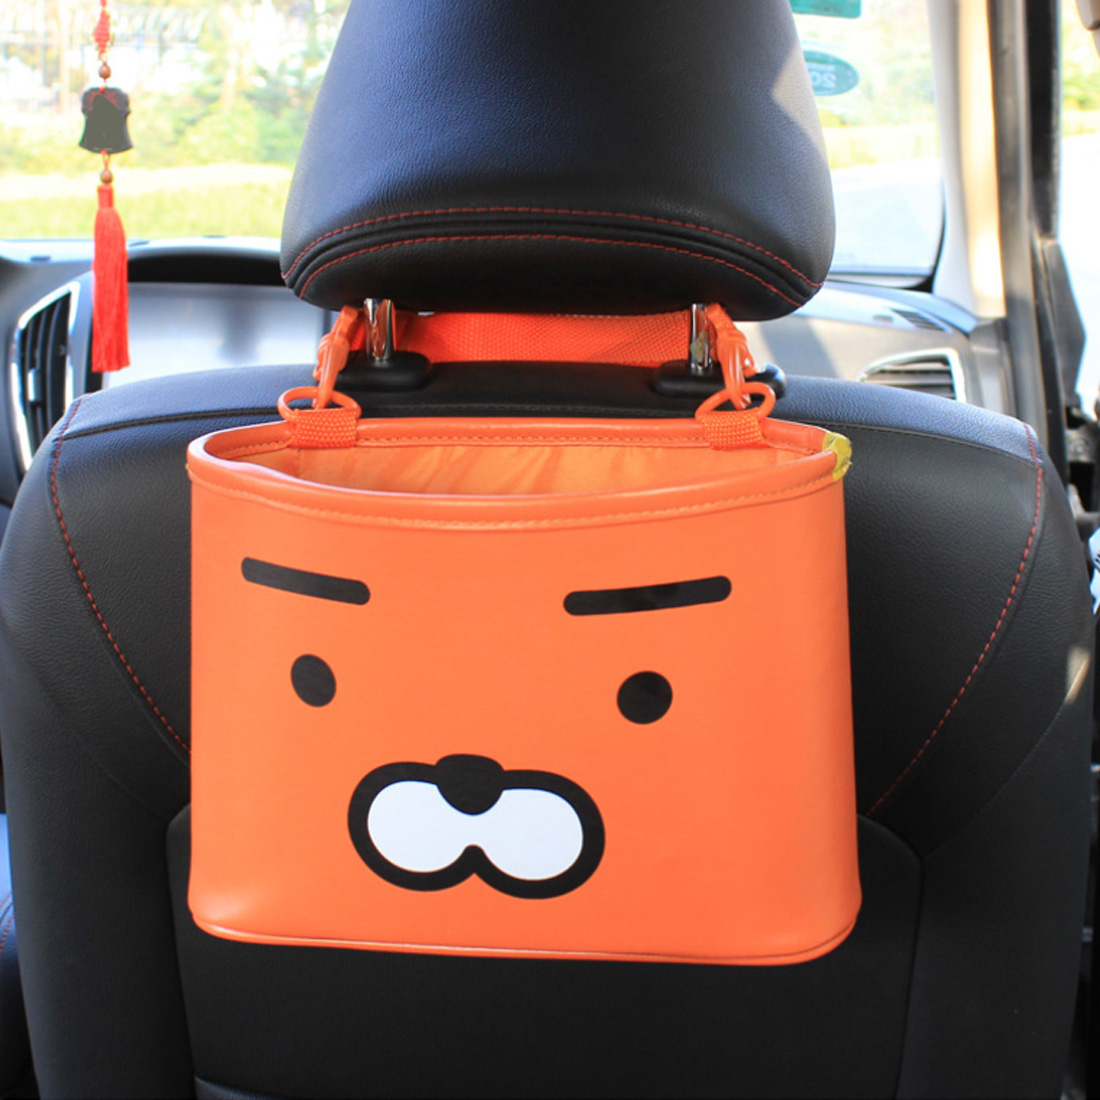 1XUniversal Leather In-Car Seat Back Organiser PAD Holder Multi Pockets Black